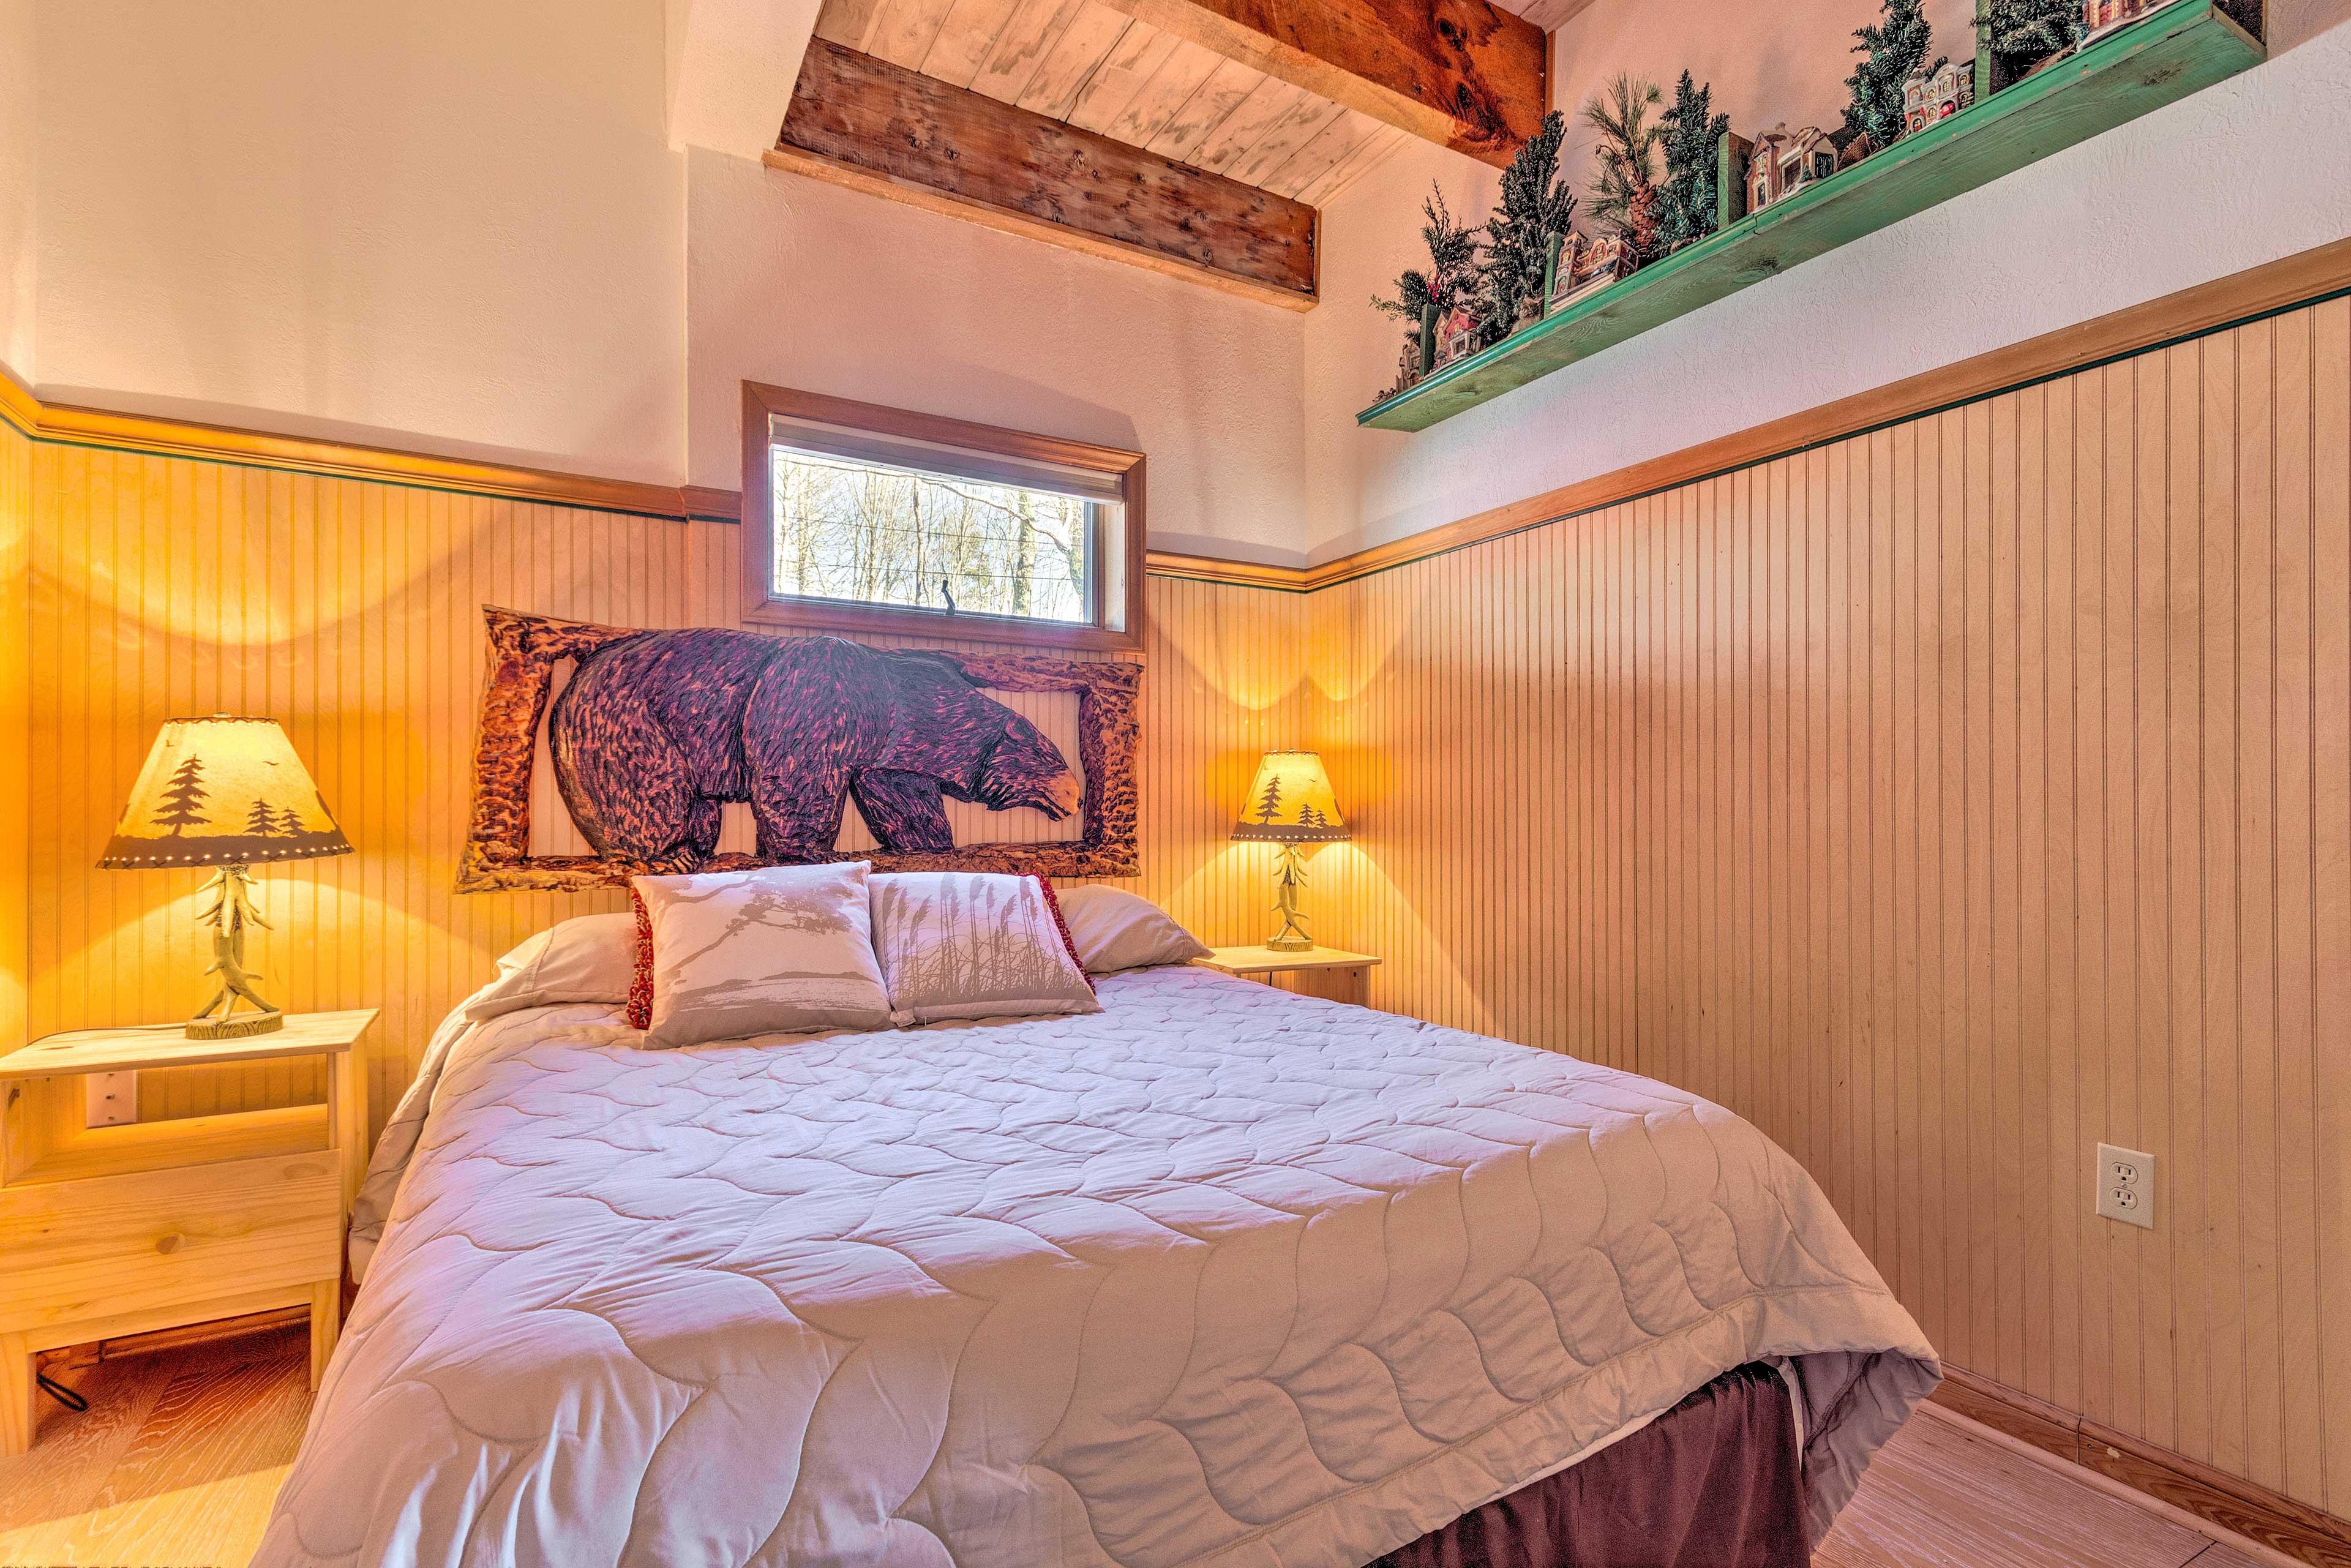 The second bedroom hosts a queen bed.